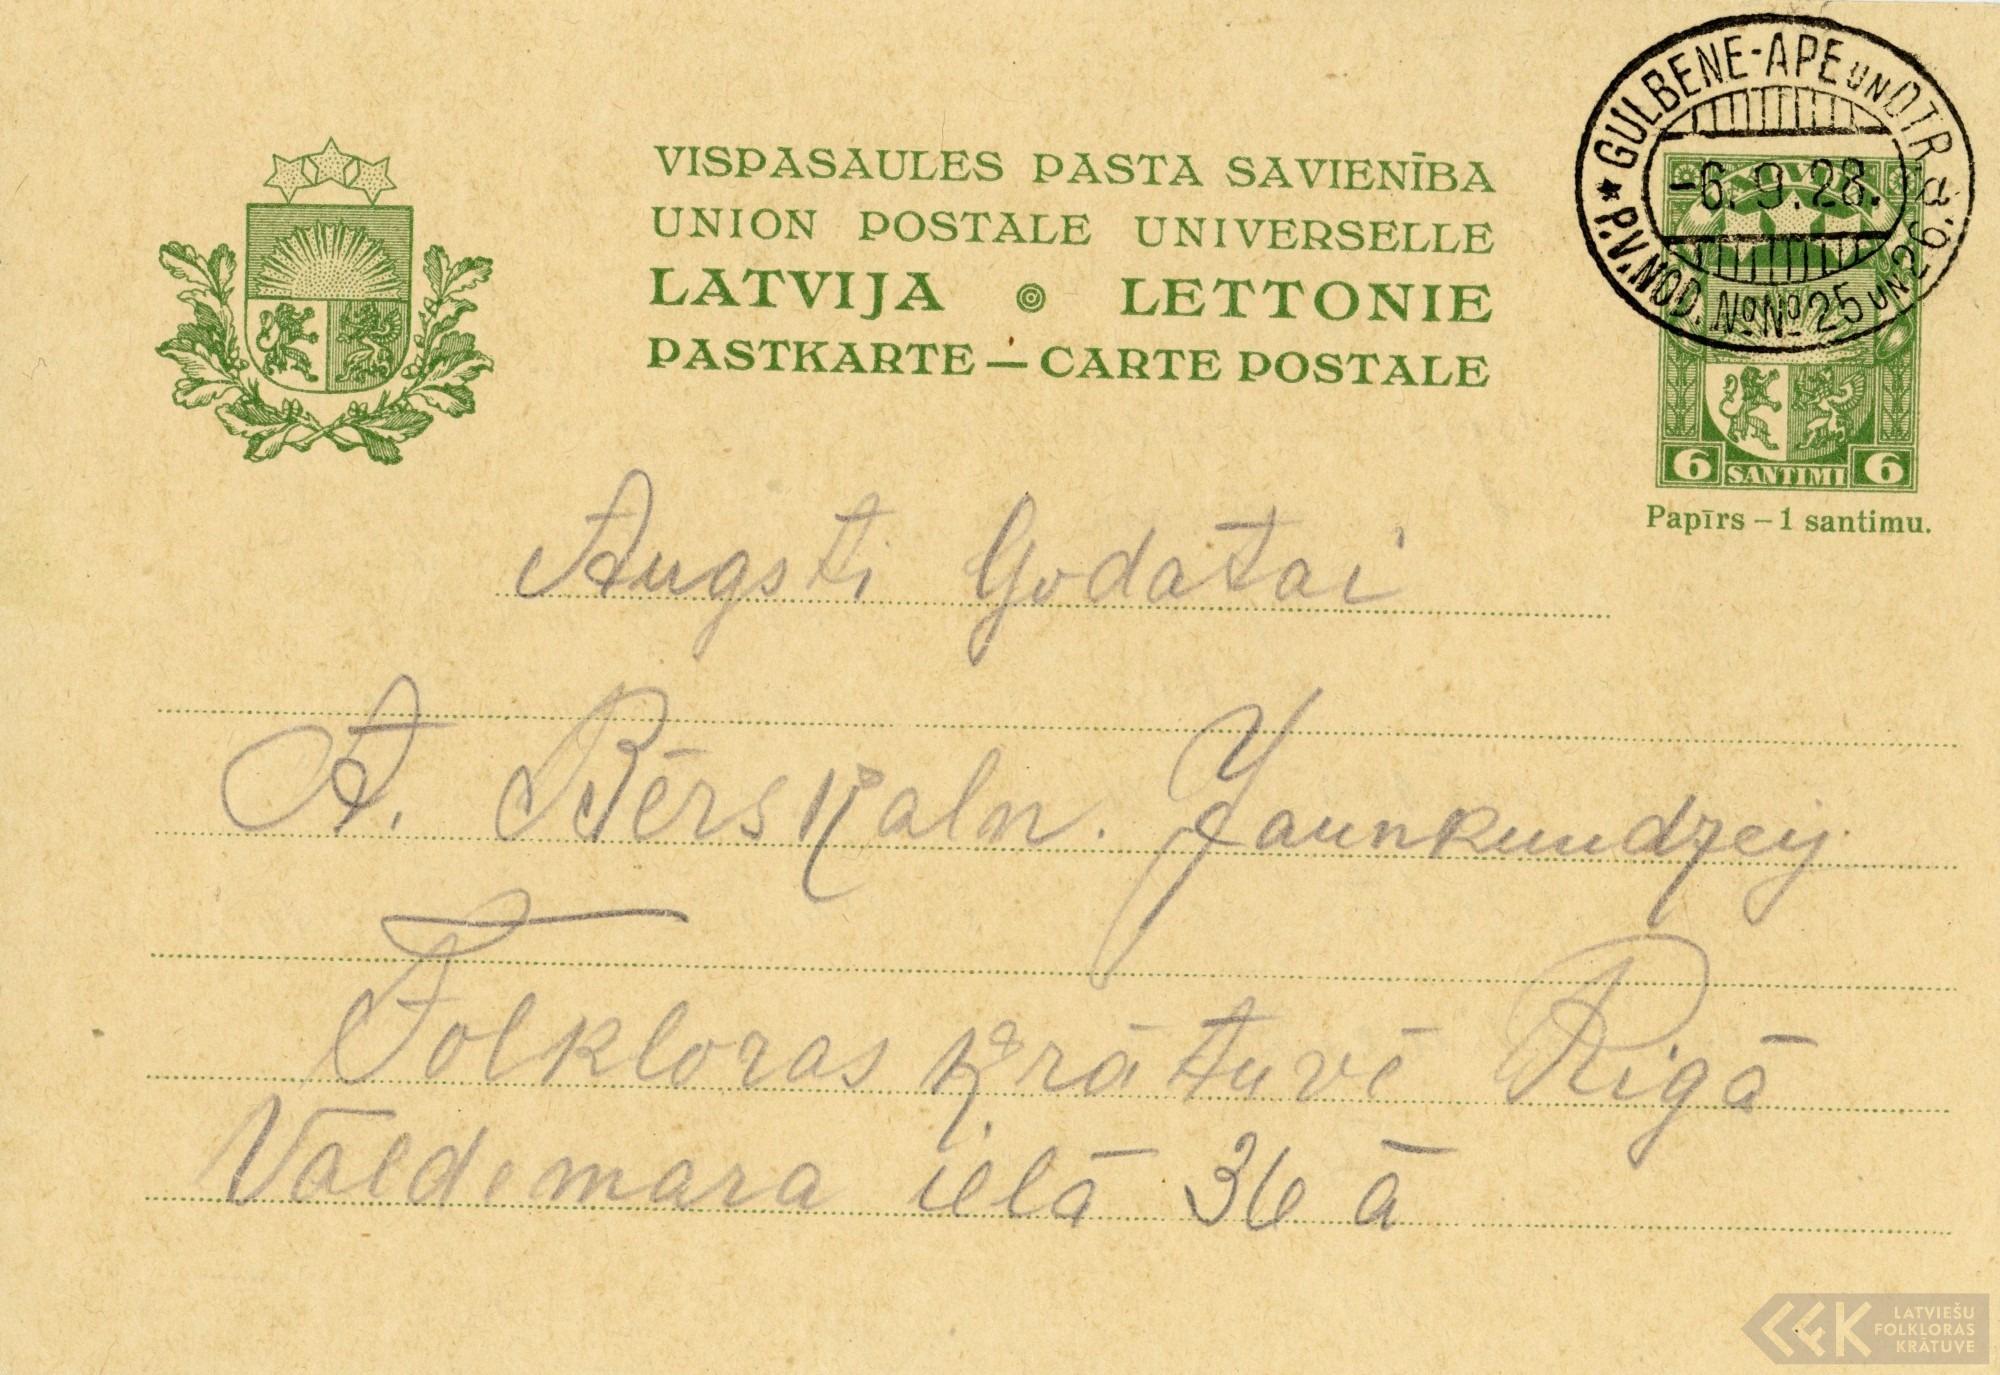 0095-O-Livina-folkloras-vakums-01-0016